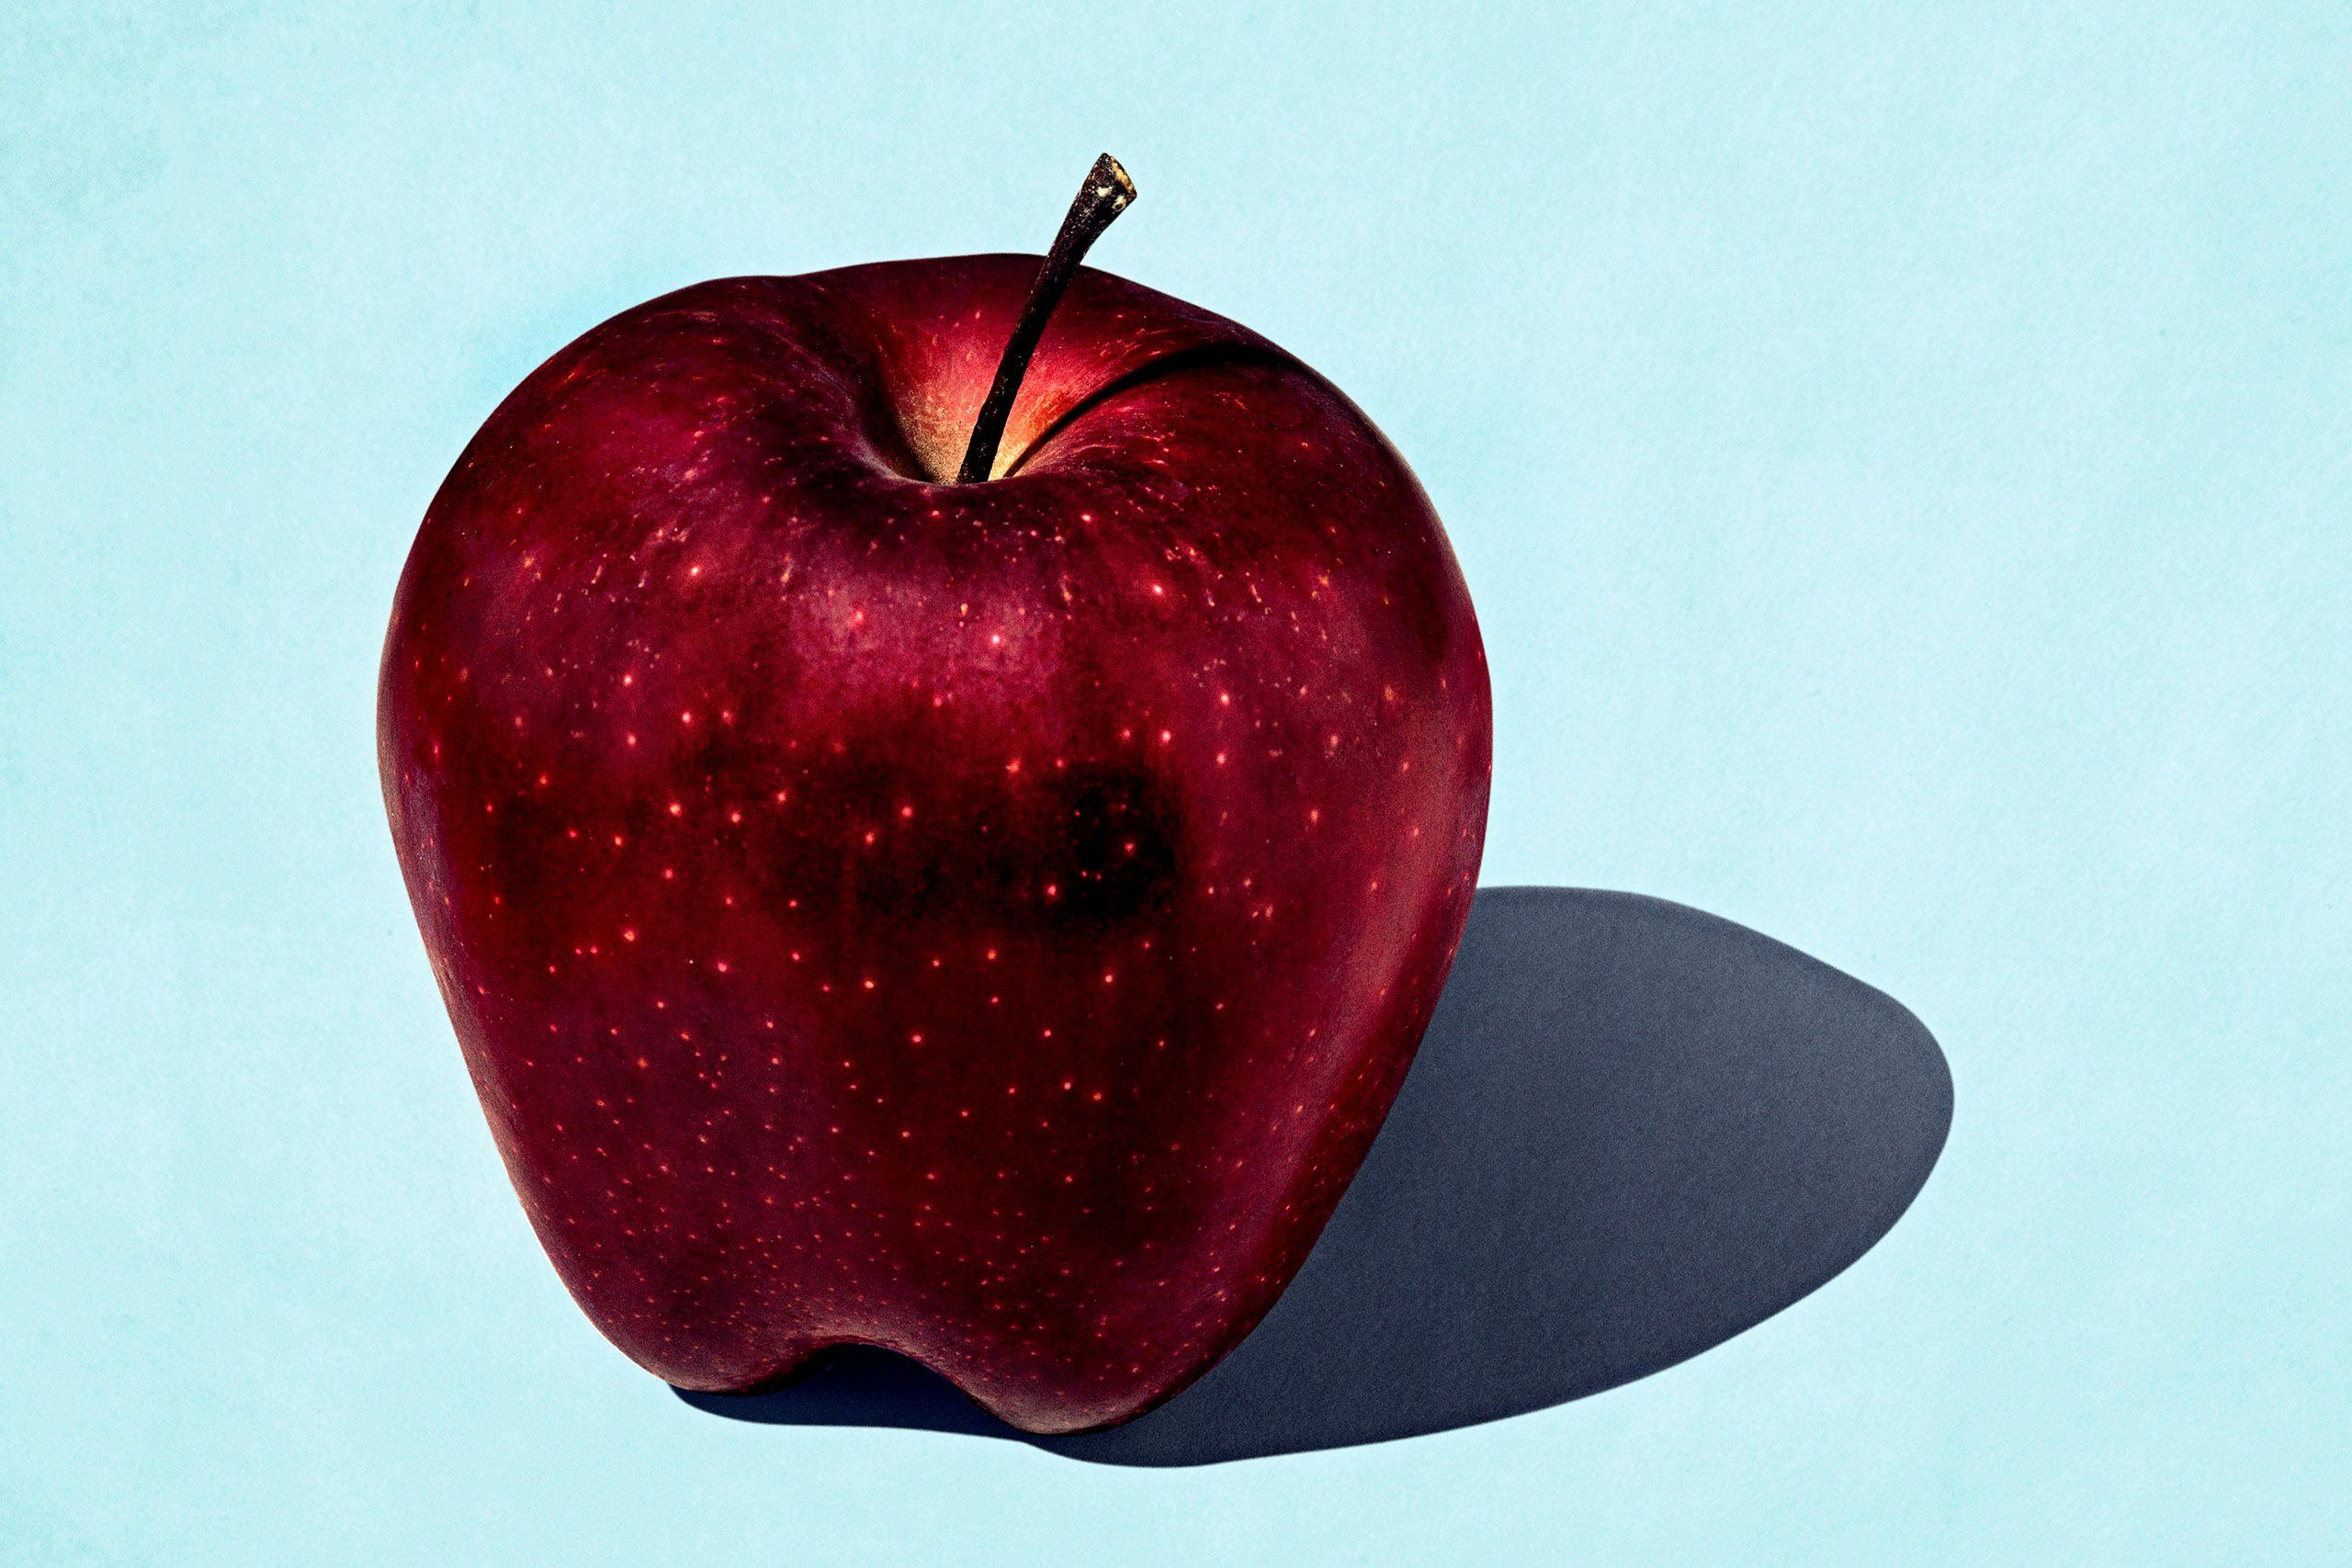 apple_h8.jpg